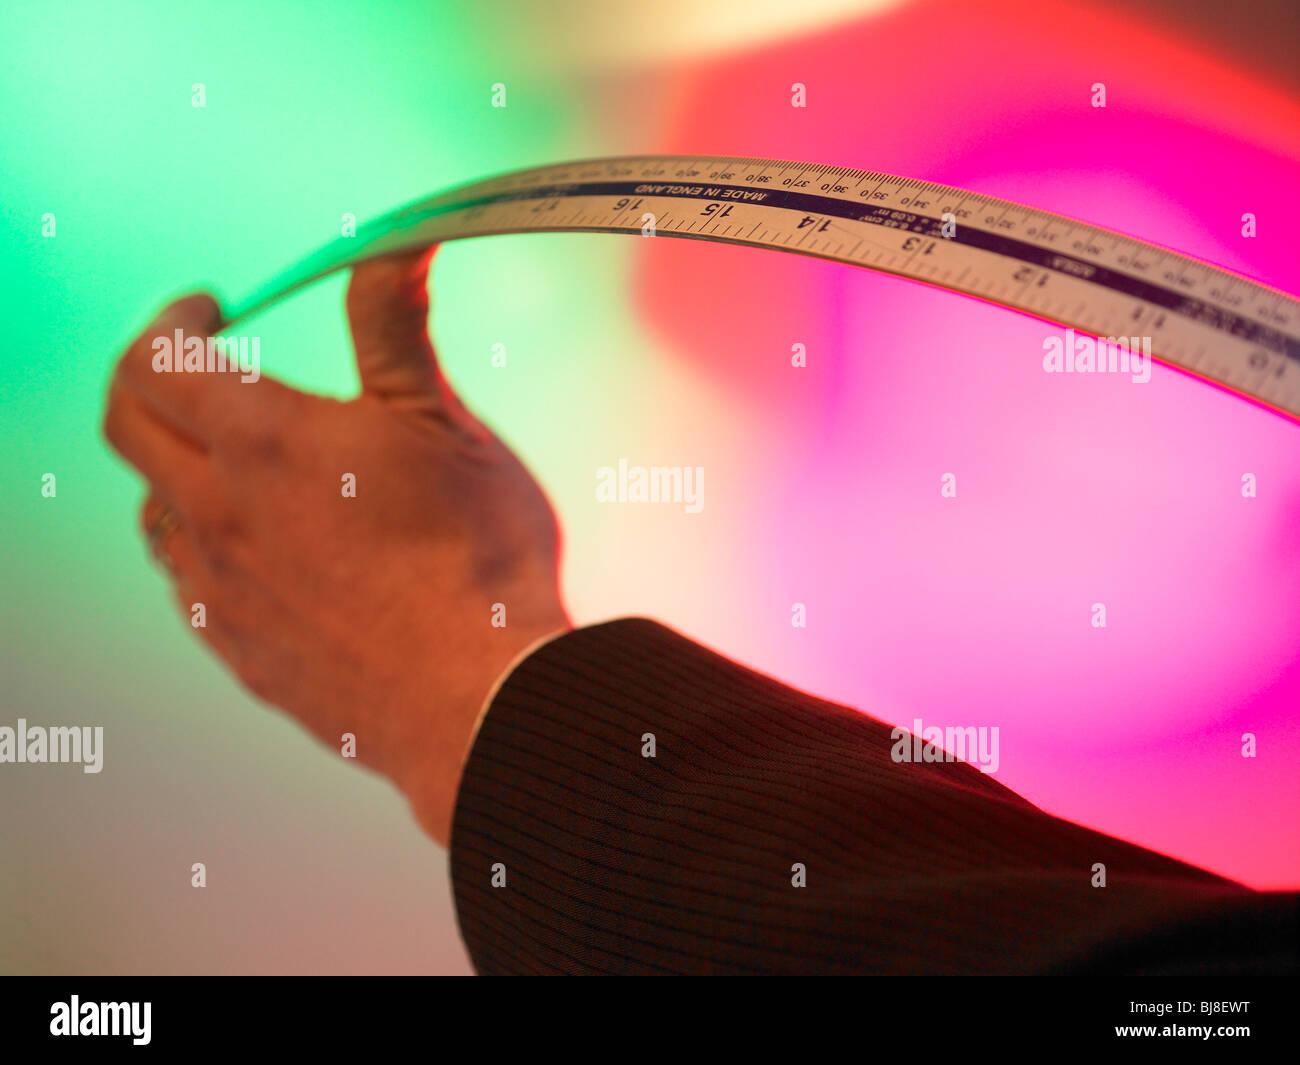 Hand bending a ruler - Stock Image